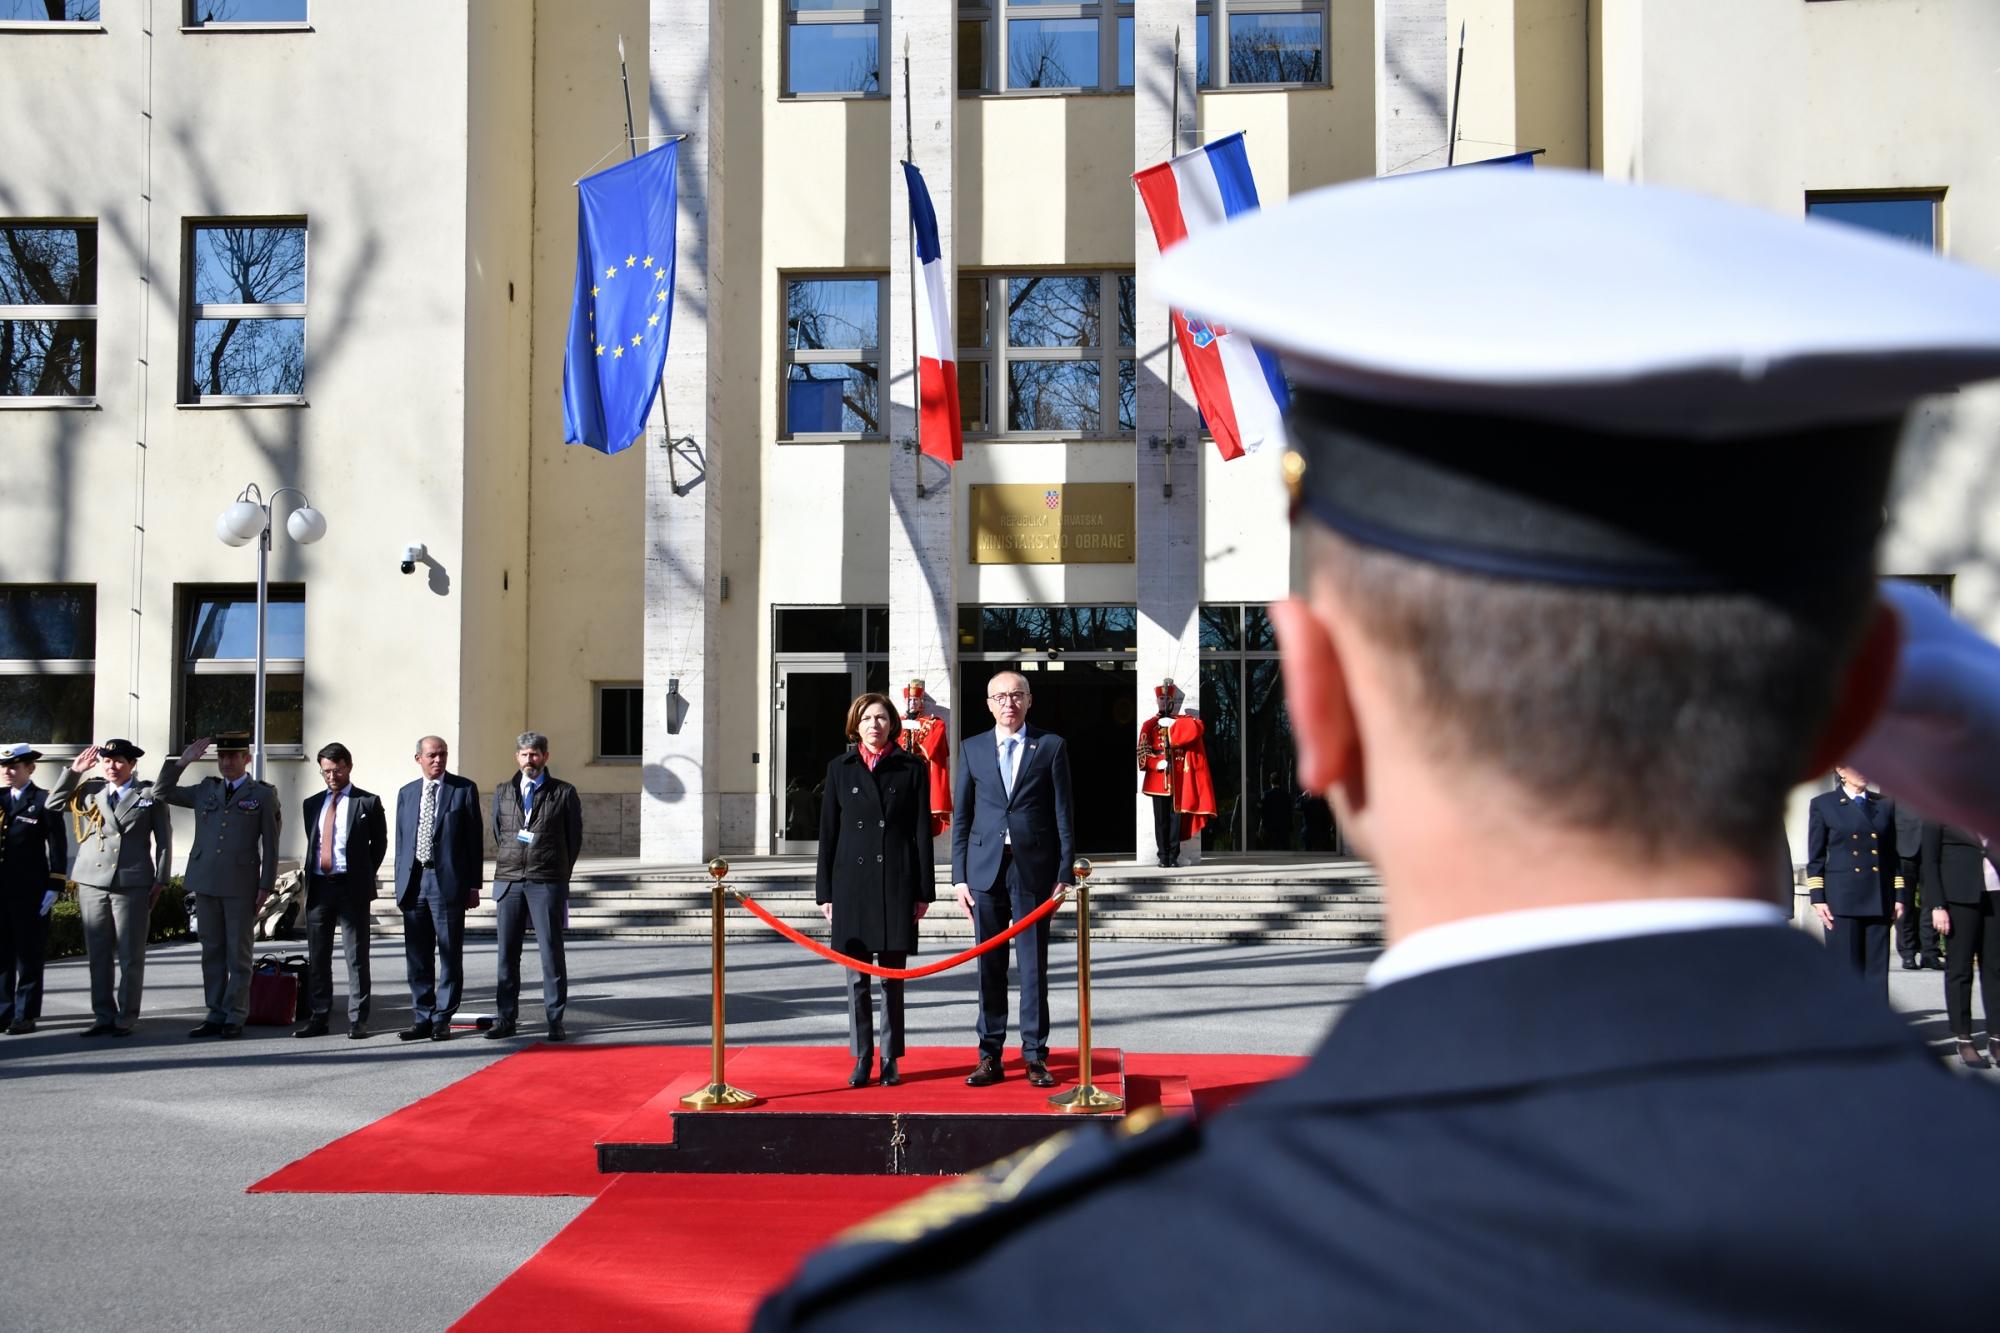 Ministar Krstičević sa francuskom ministricom Parly u MORH-u | Foto: MORH / F. Klen